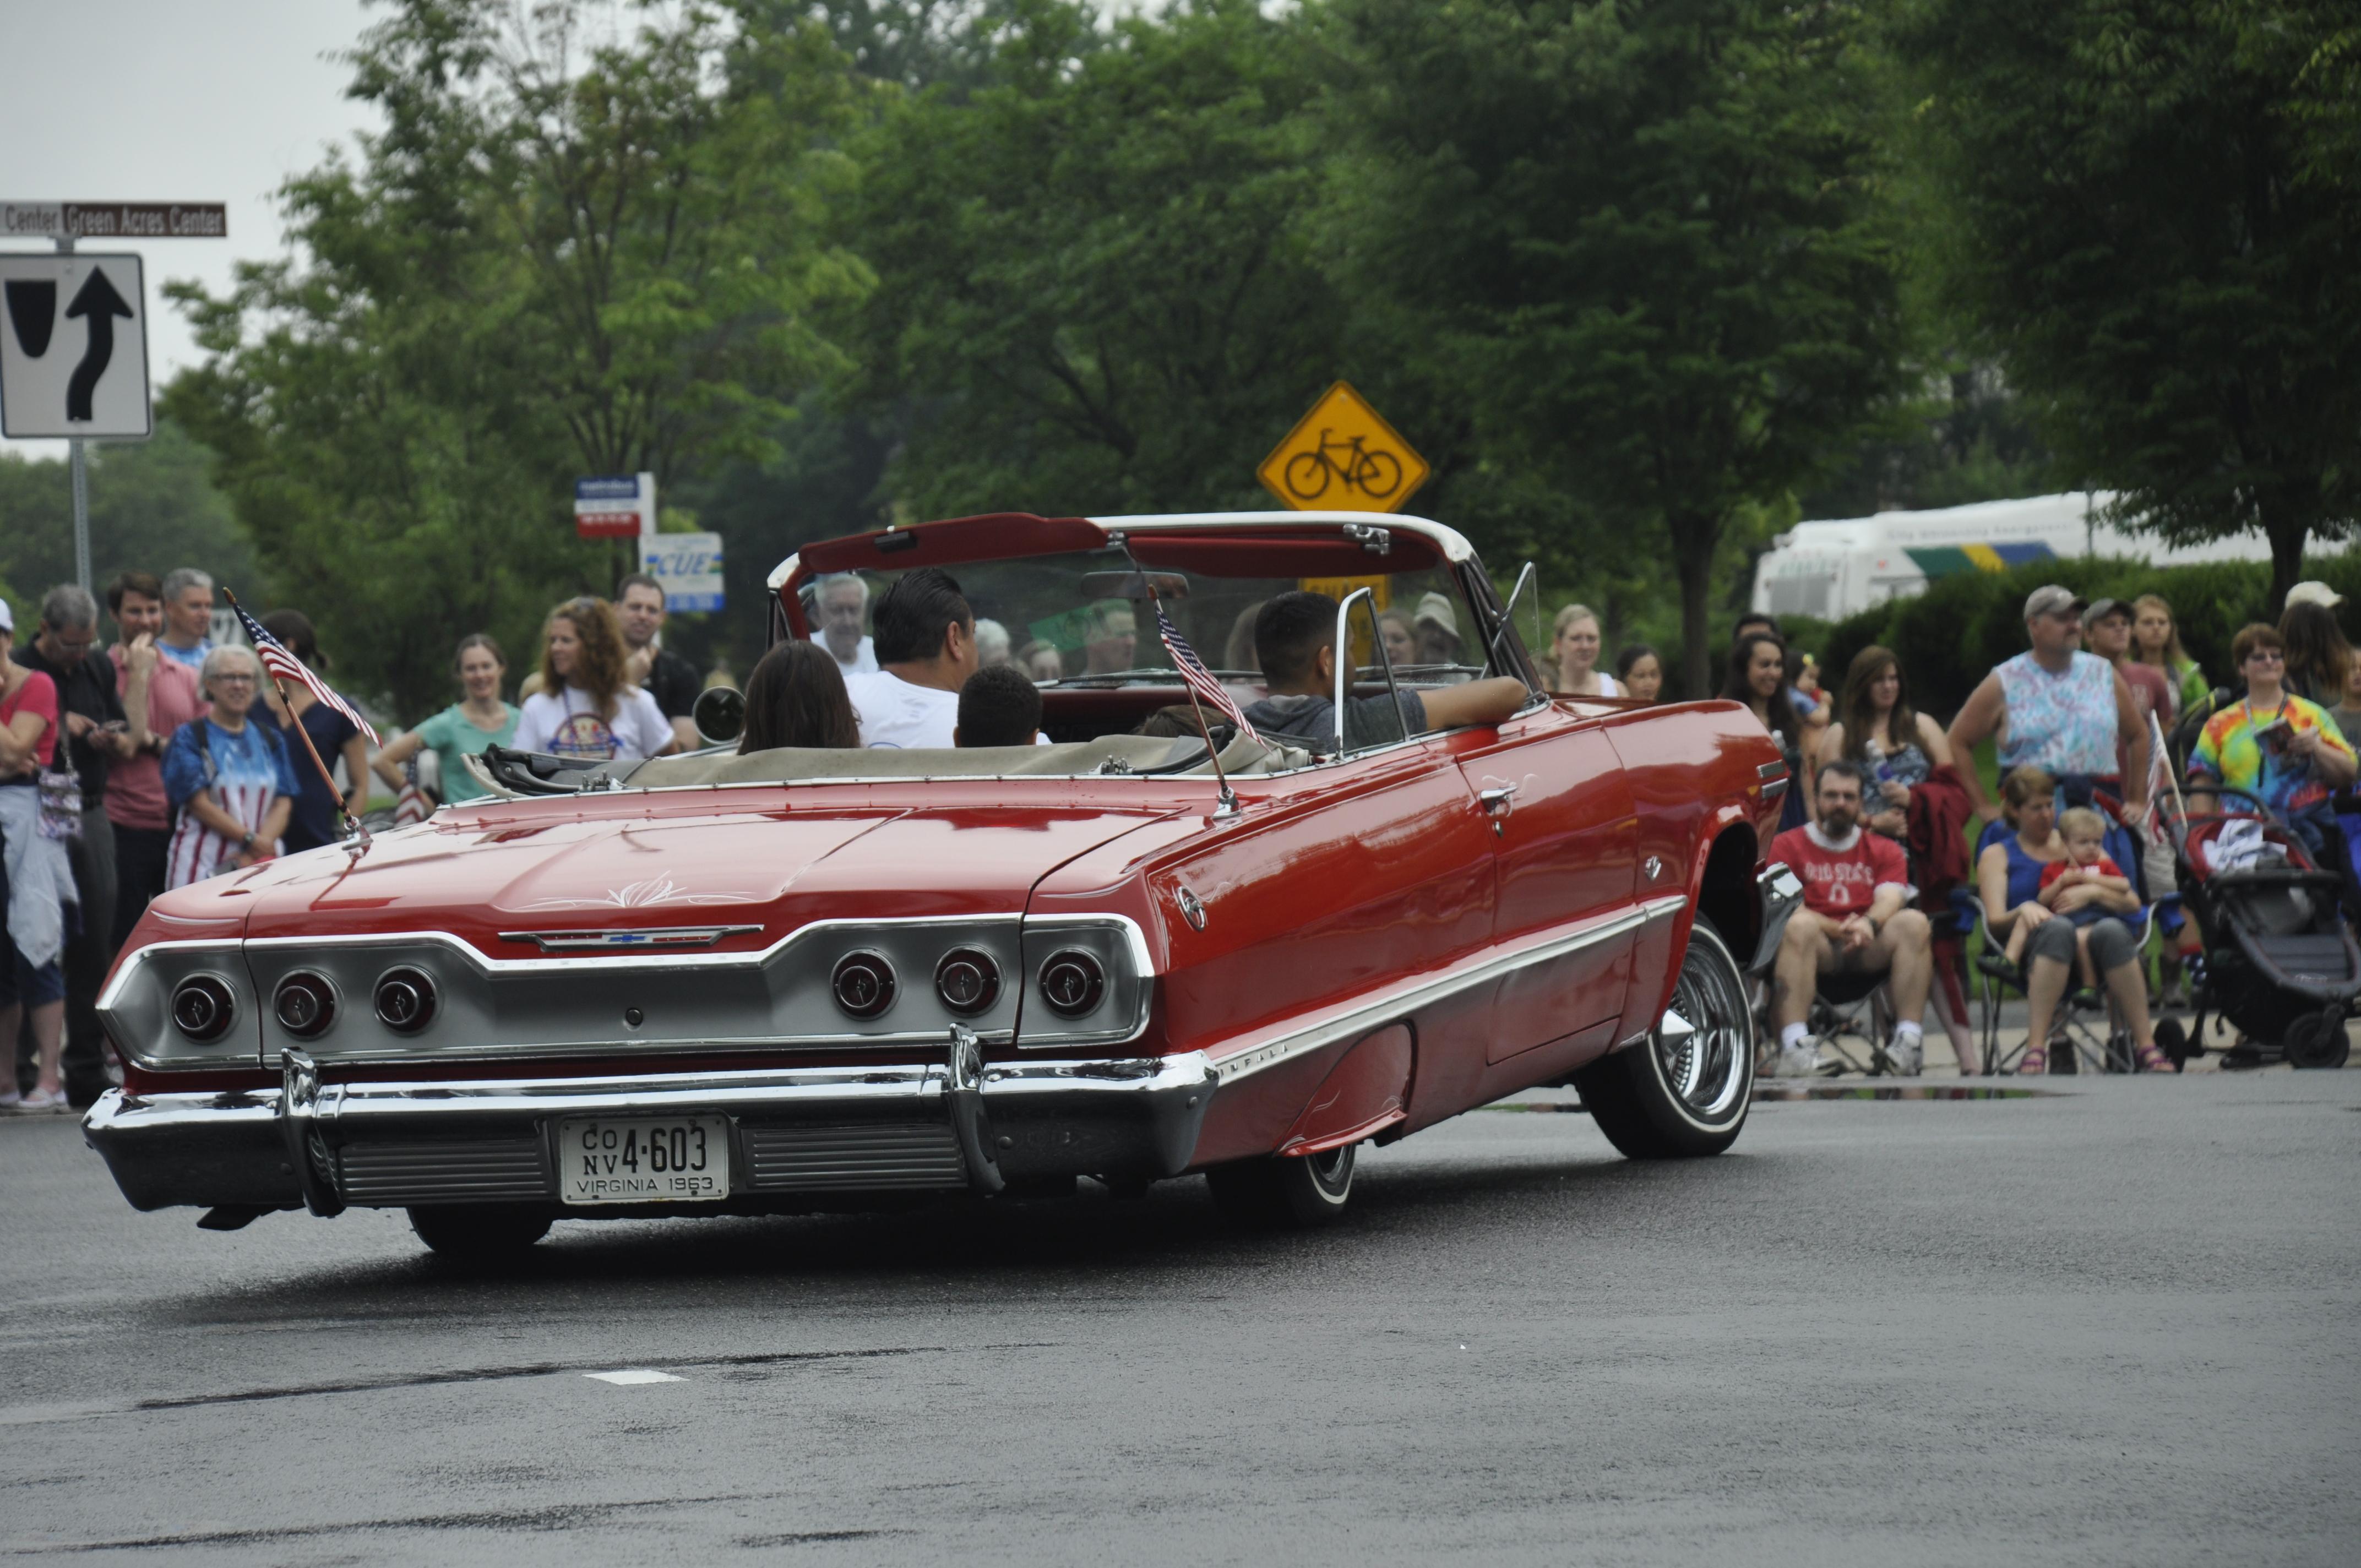 Filefairfax City Parade 2015 07 04 Chevrolet Impala Convertible